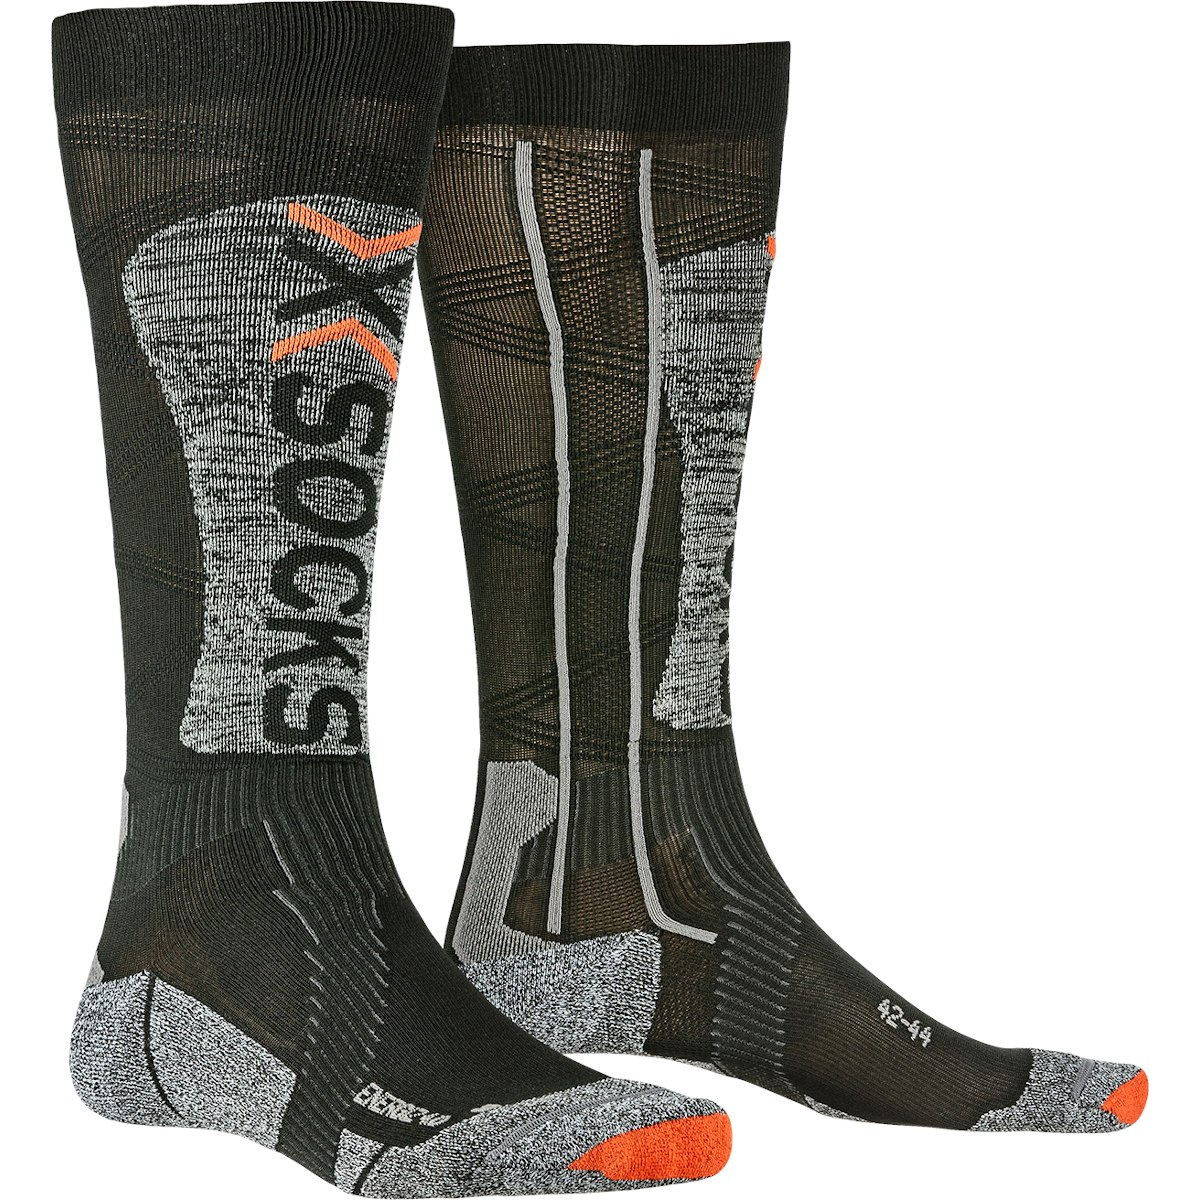 X-Socks Ski Energizer Light 4.0 Socken - black/stone grey melange